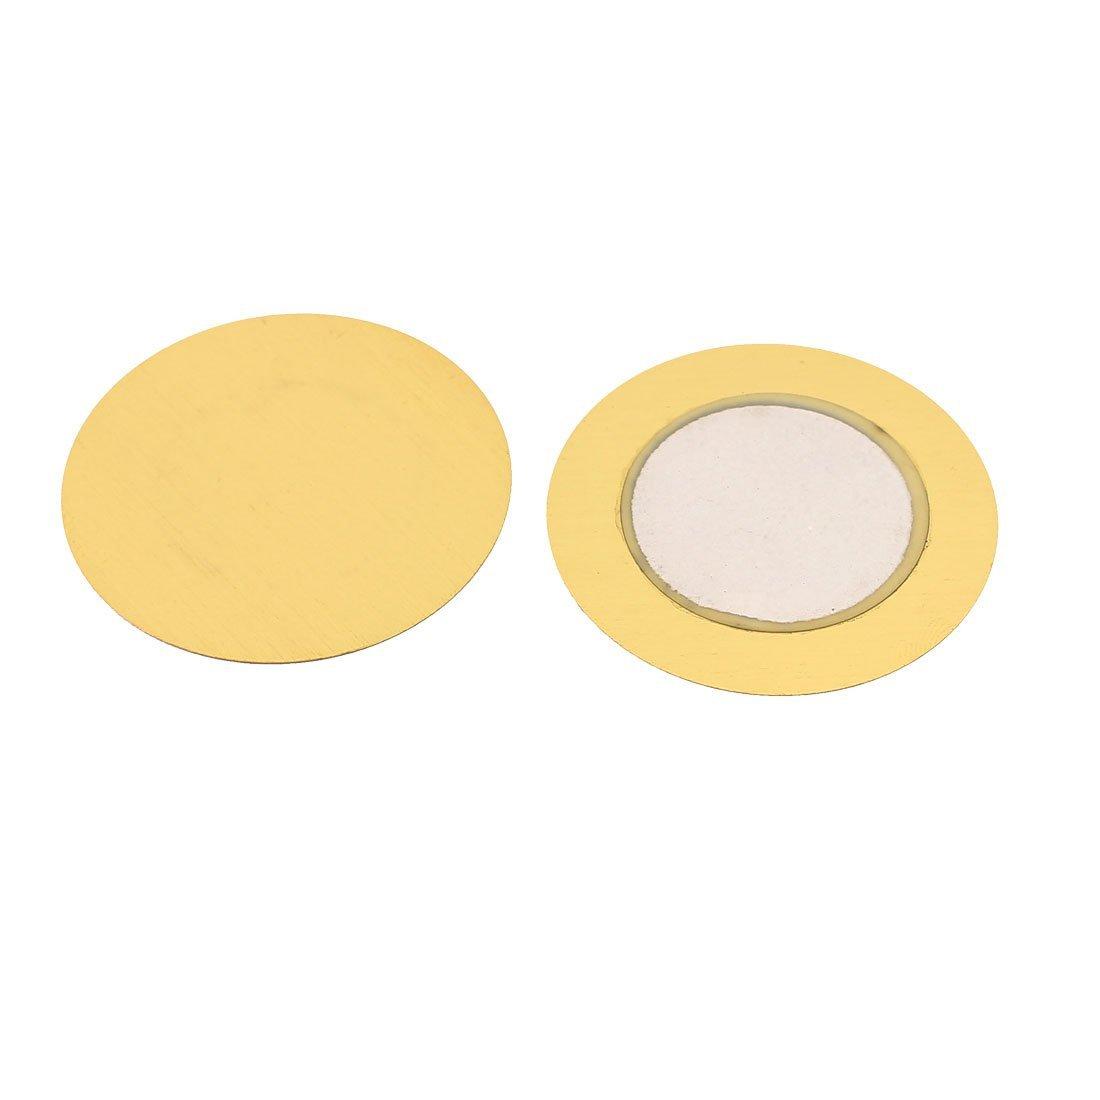 15pcs 20mm Diameter Piezo Discs Piezoelectric Ceramic Copper Buzzer Film Gasket